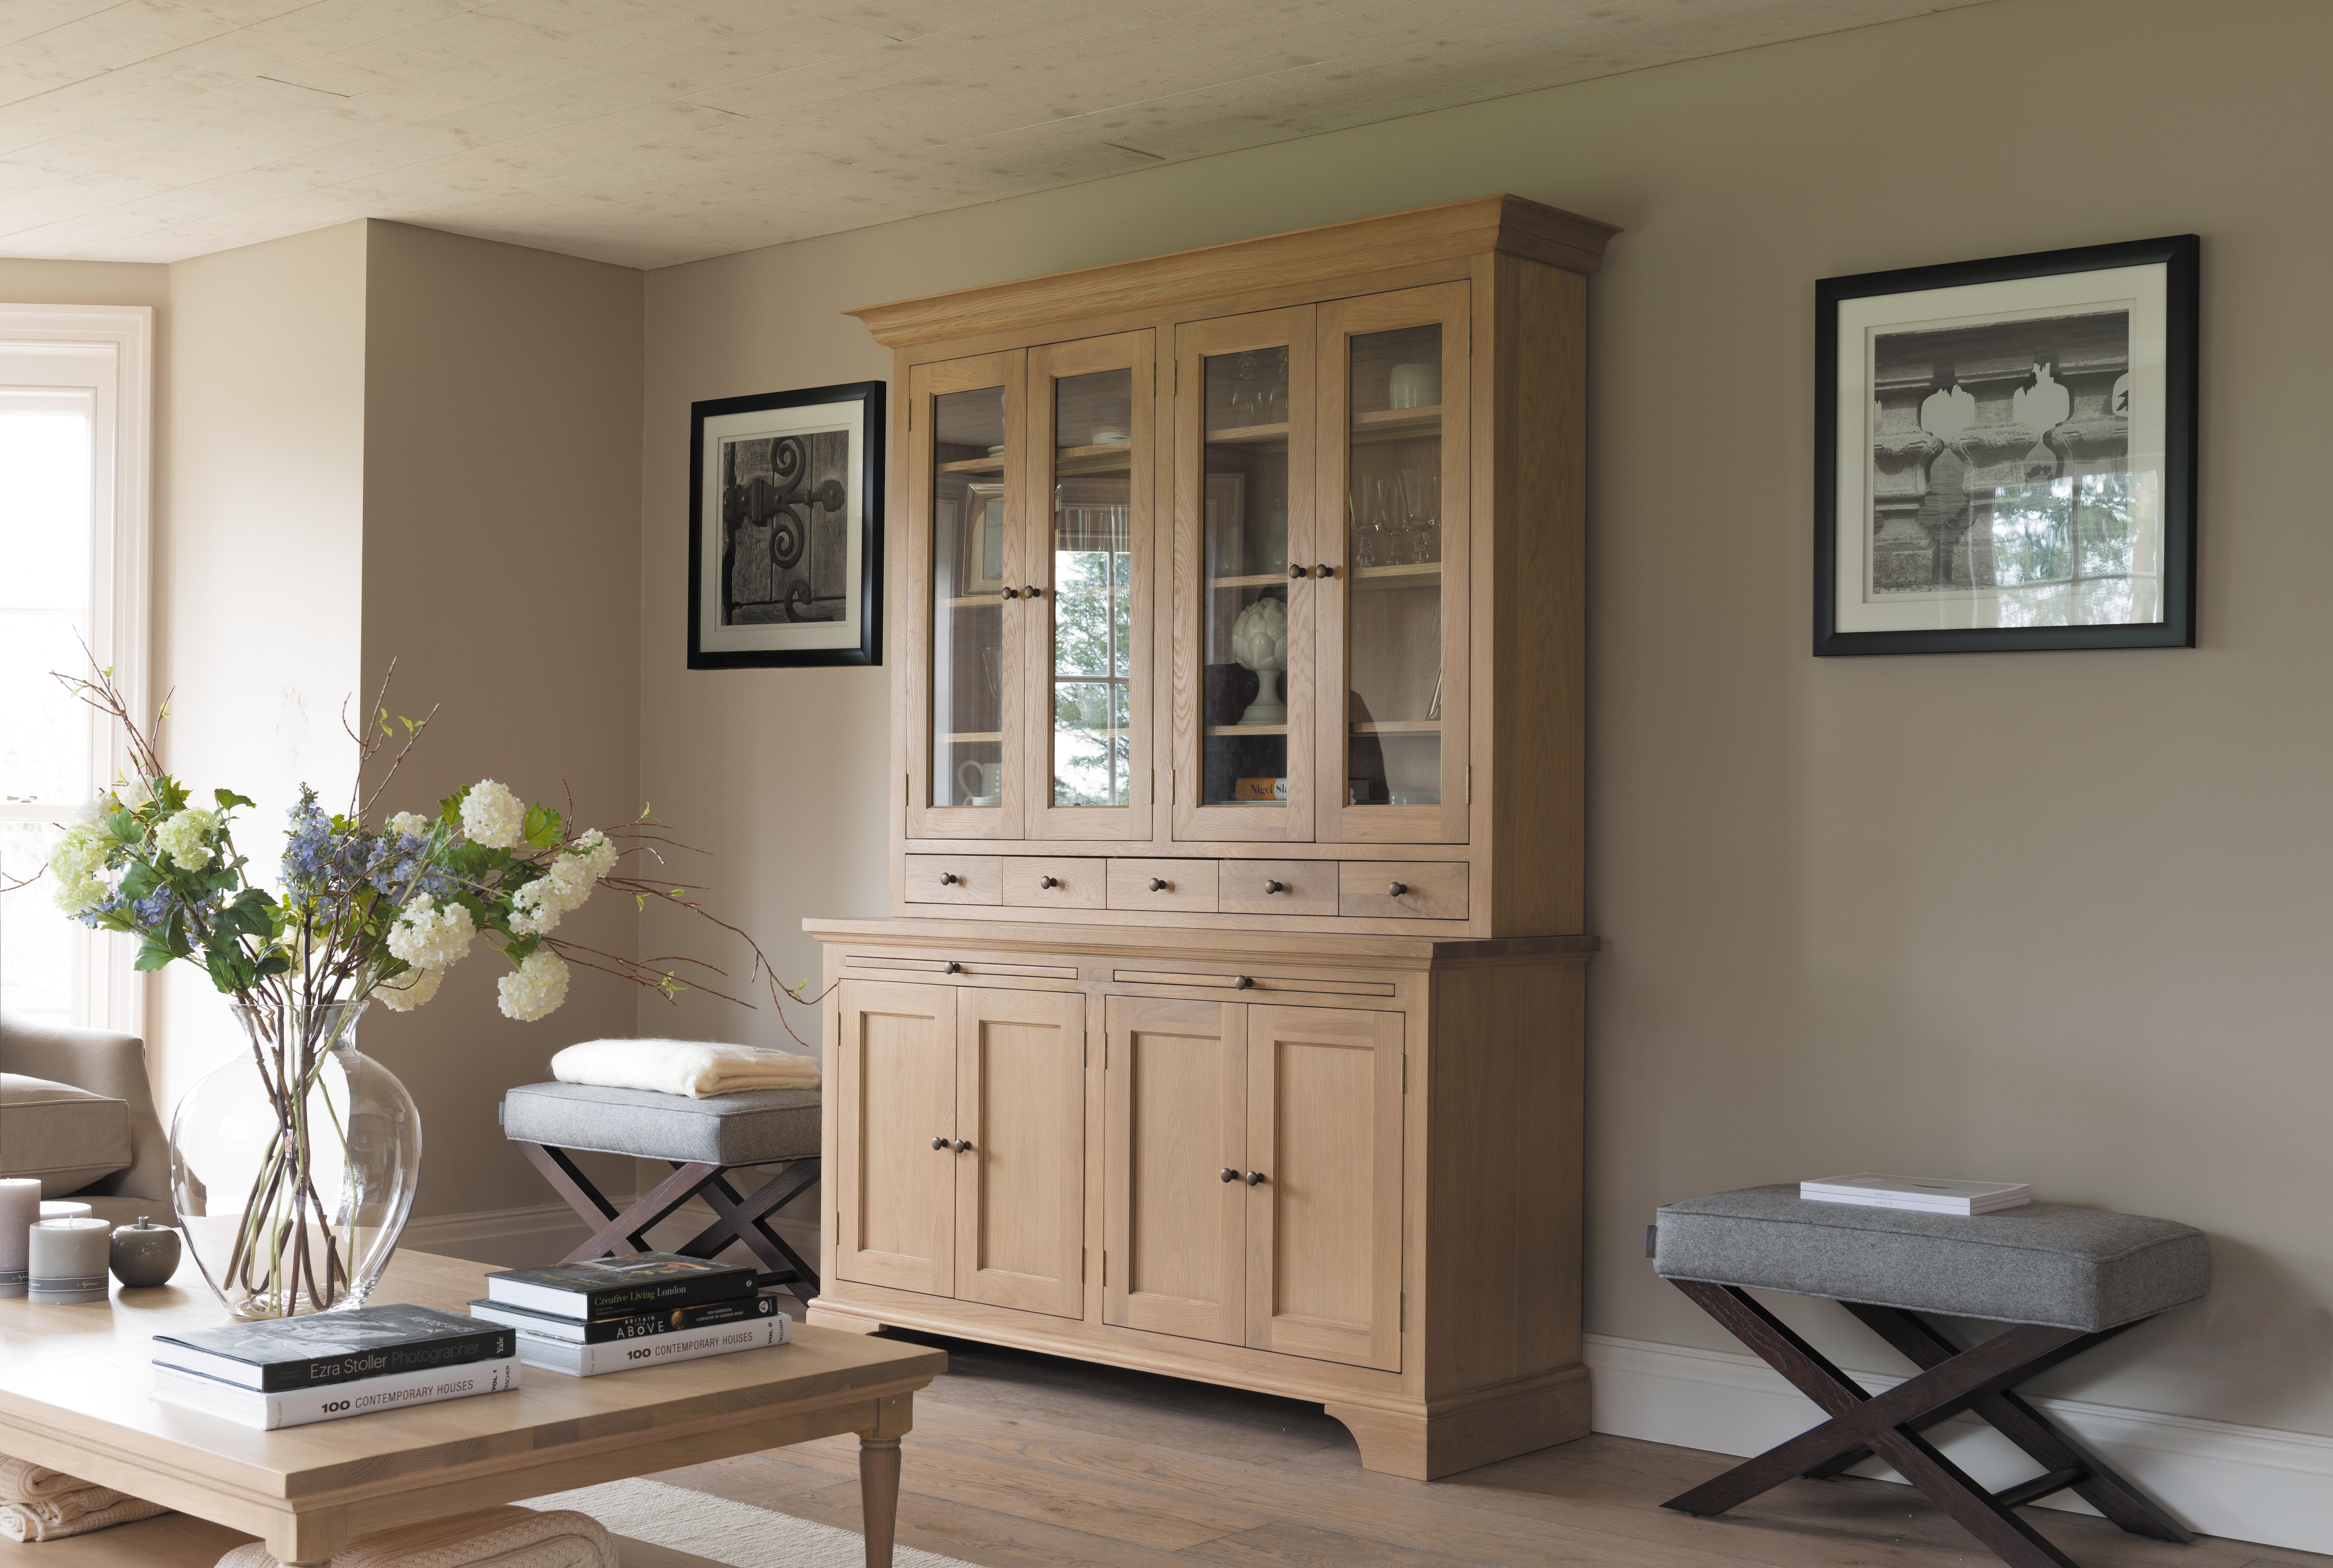 neptune henley 5ft glazed oak dresser dining furniture handcrafted kitchen bespoke kitchens neptune kitchen